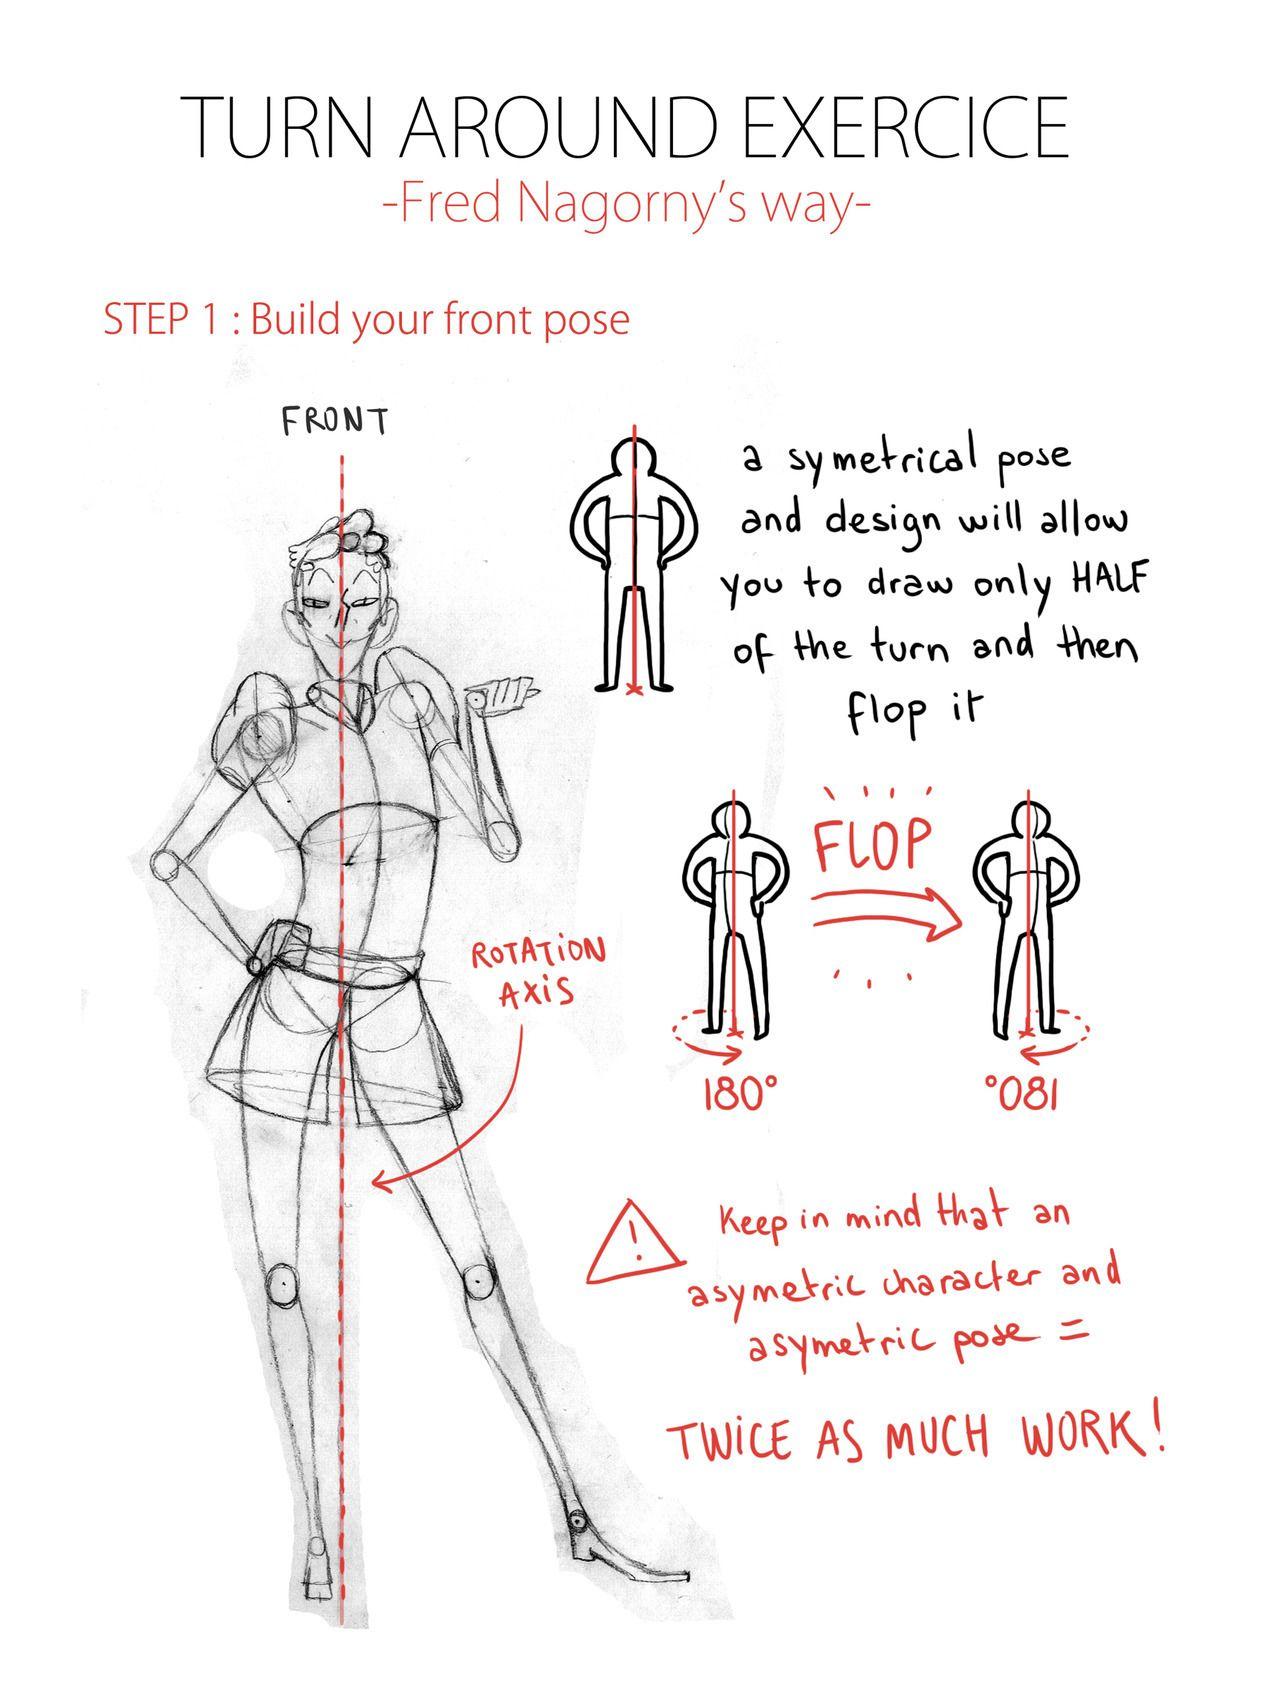 Halo! A friend of mine asked me to teach him the Gobelins way to animate a turn around, so I drew... - #2d #Animation #around #crfa19 #gobelins #hereyougoKarlo #turn